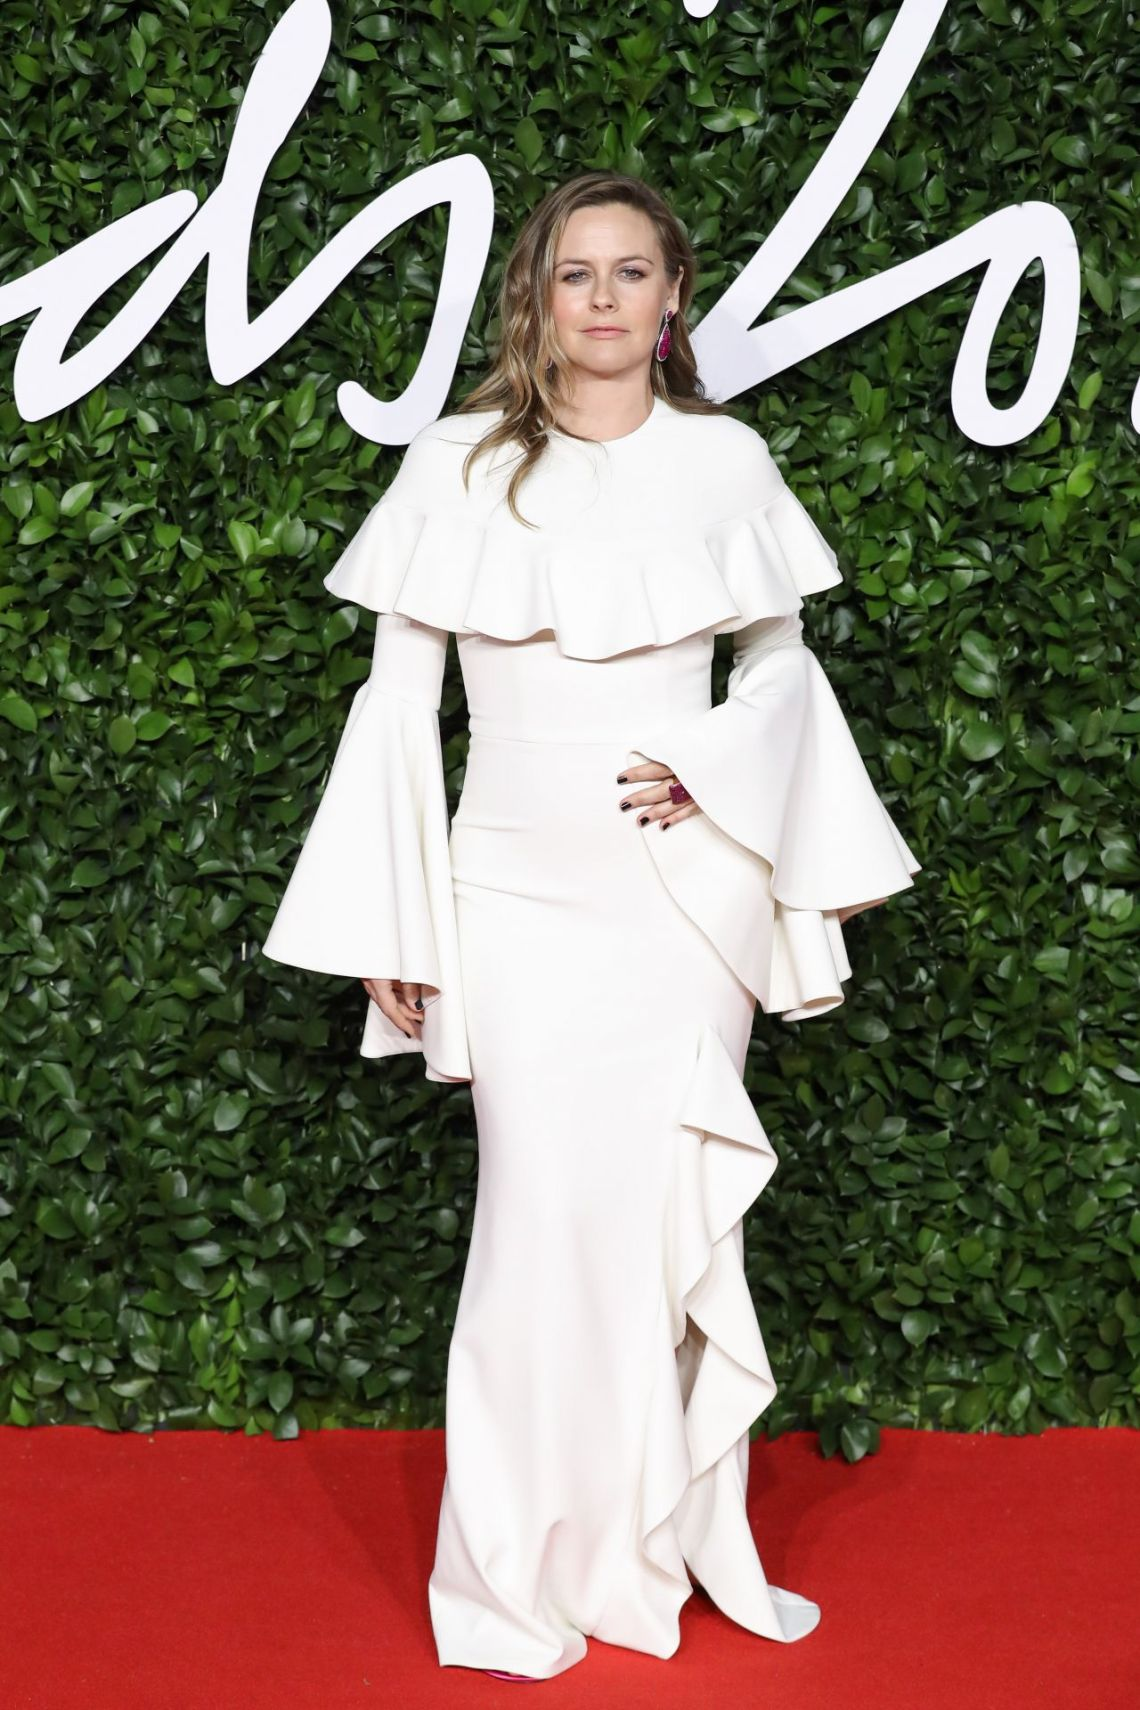 alicia-silverstone-fashion-awards-2019-red-carpet-in-london-5